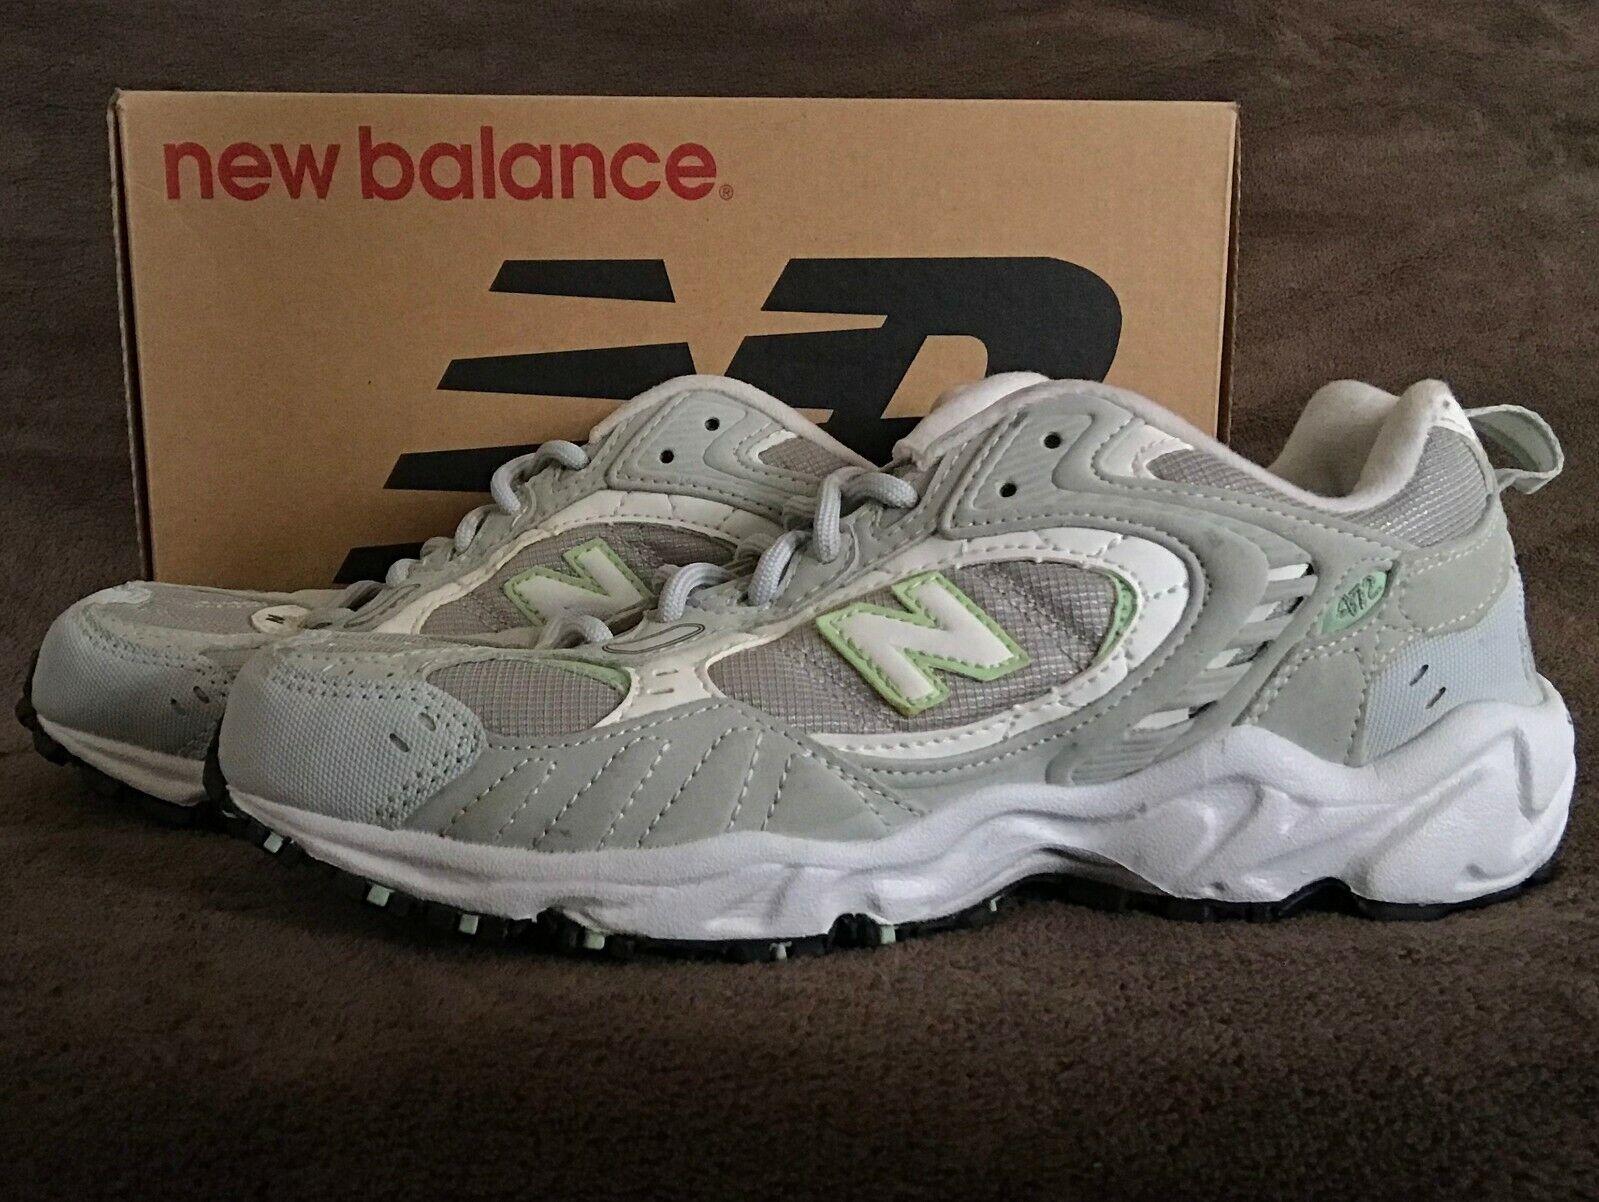 globale soddisfare Risata  New Balance 472 купить на eBay в Америке, лот 264834412245